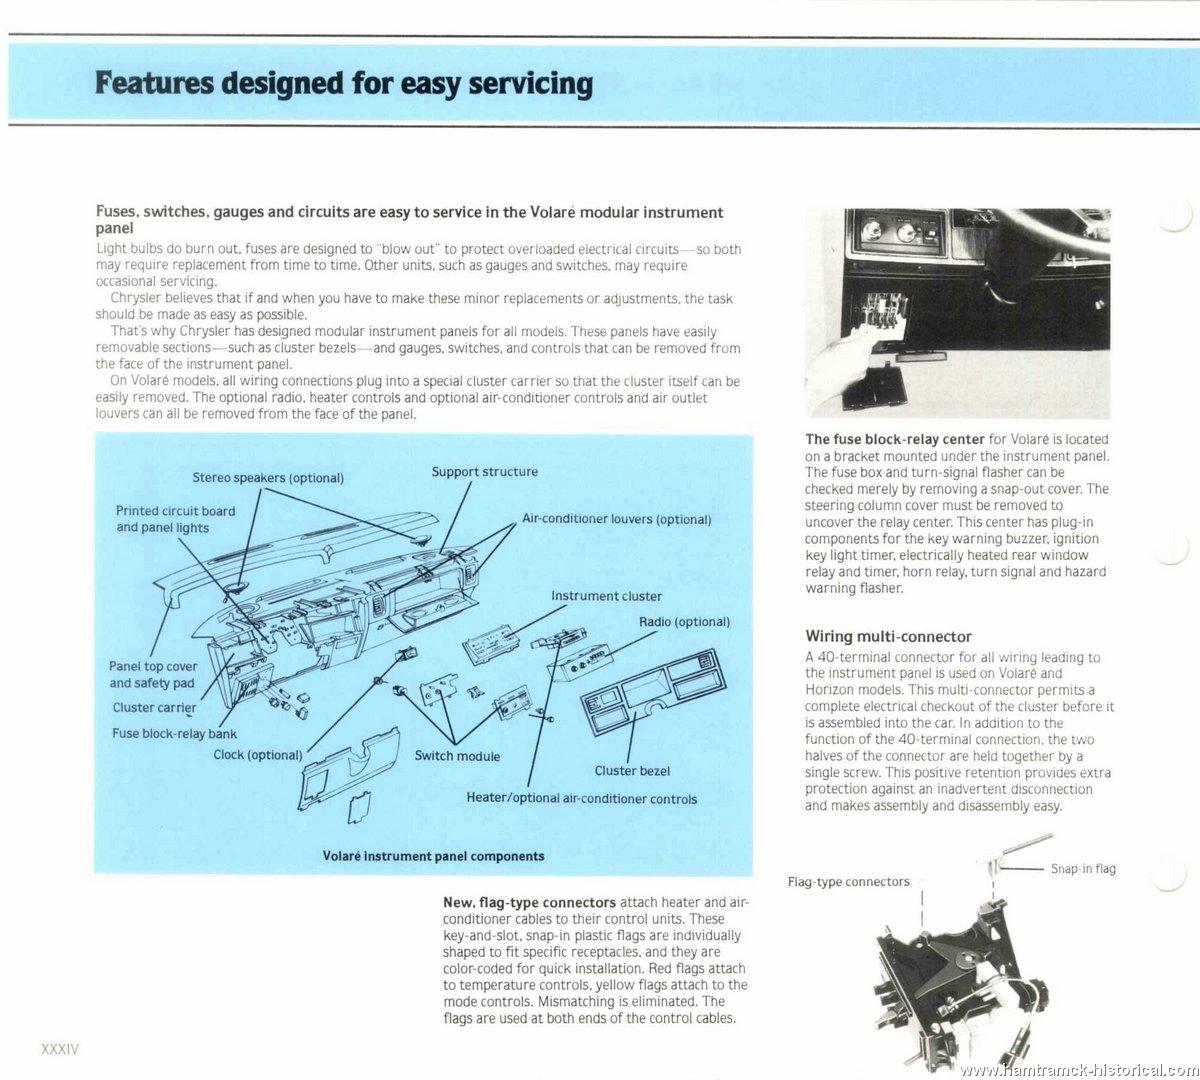 The 1970 Hamtramck Registry 1979 Plymouth Dealership Data Book Horizon Fuse Box Diagram Image 79 Engineering 0032